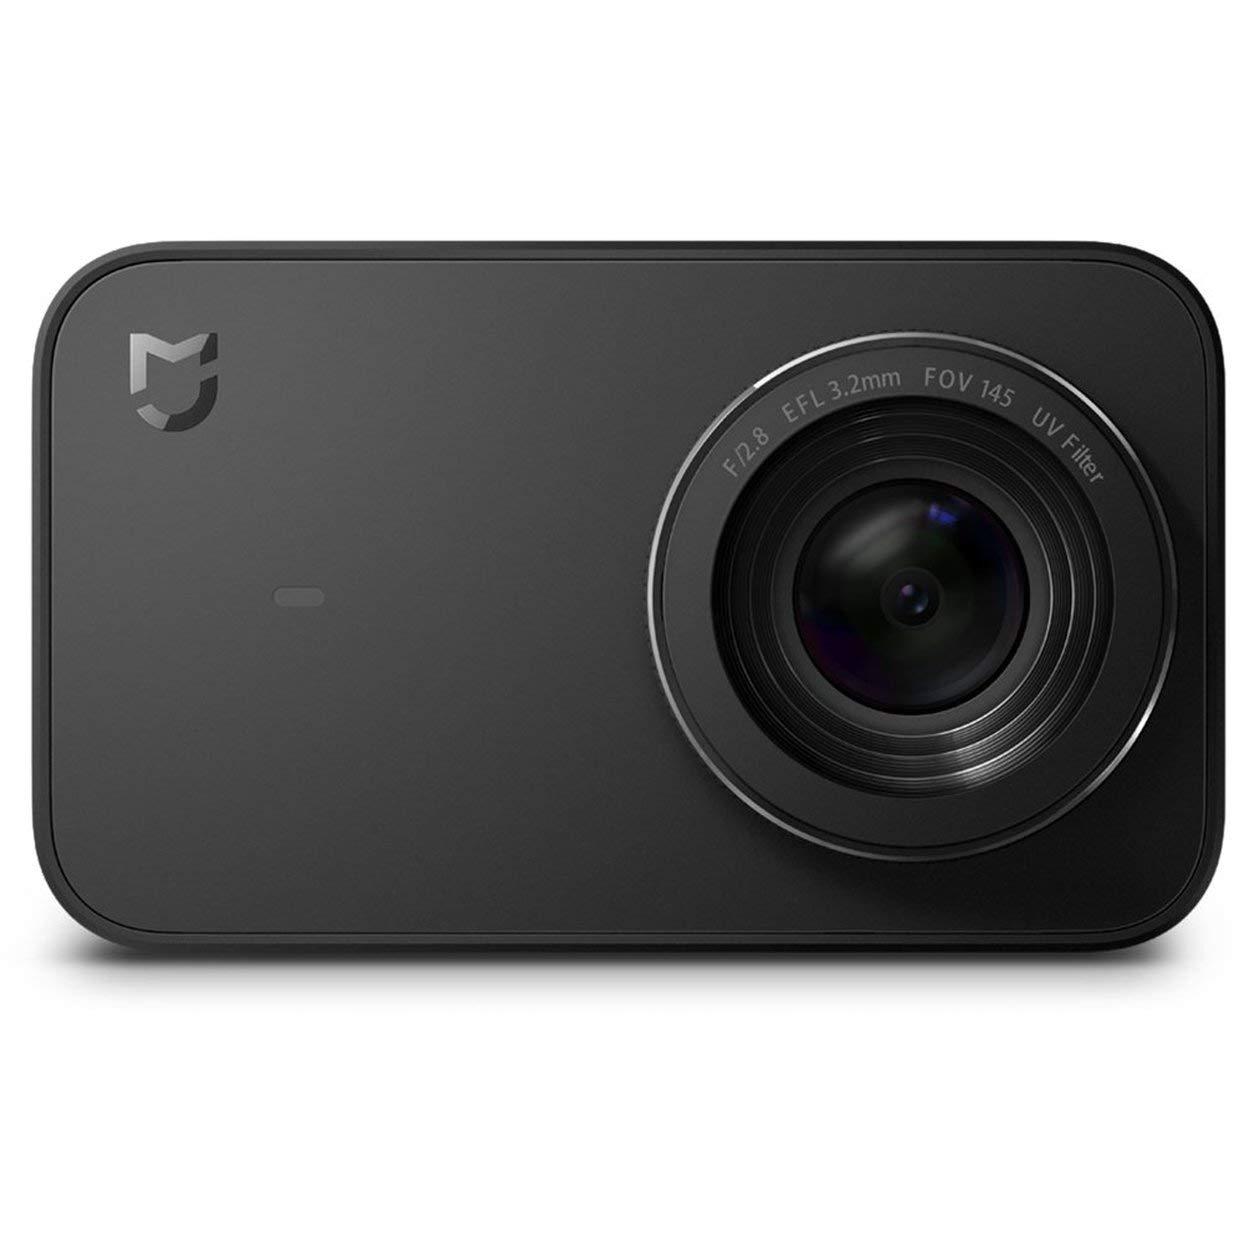 Dailyinshop Xiaomi Mijia Action Kamera 4 Karat 1080 P Wifi Drahtlose Blautooth 4.1 2,4-Zoll Touchscreen Globale Version 145 ° Weitwinkel (Farbe  Schwarz)